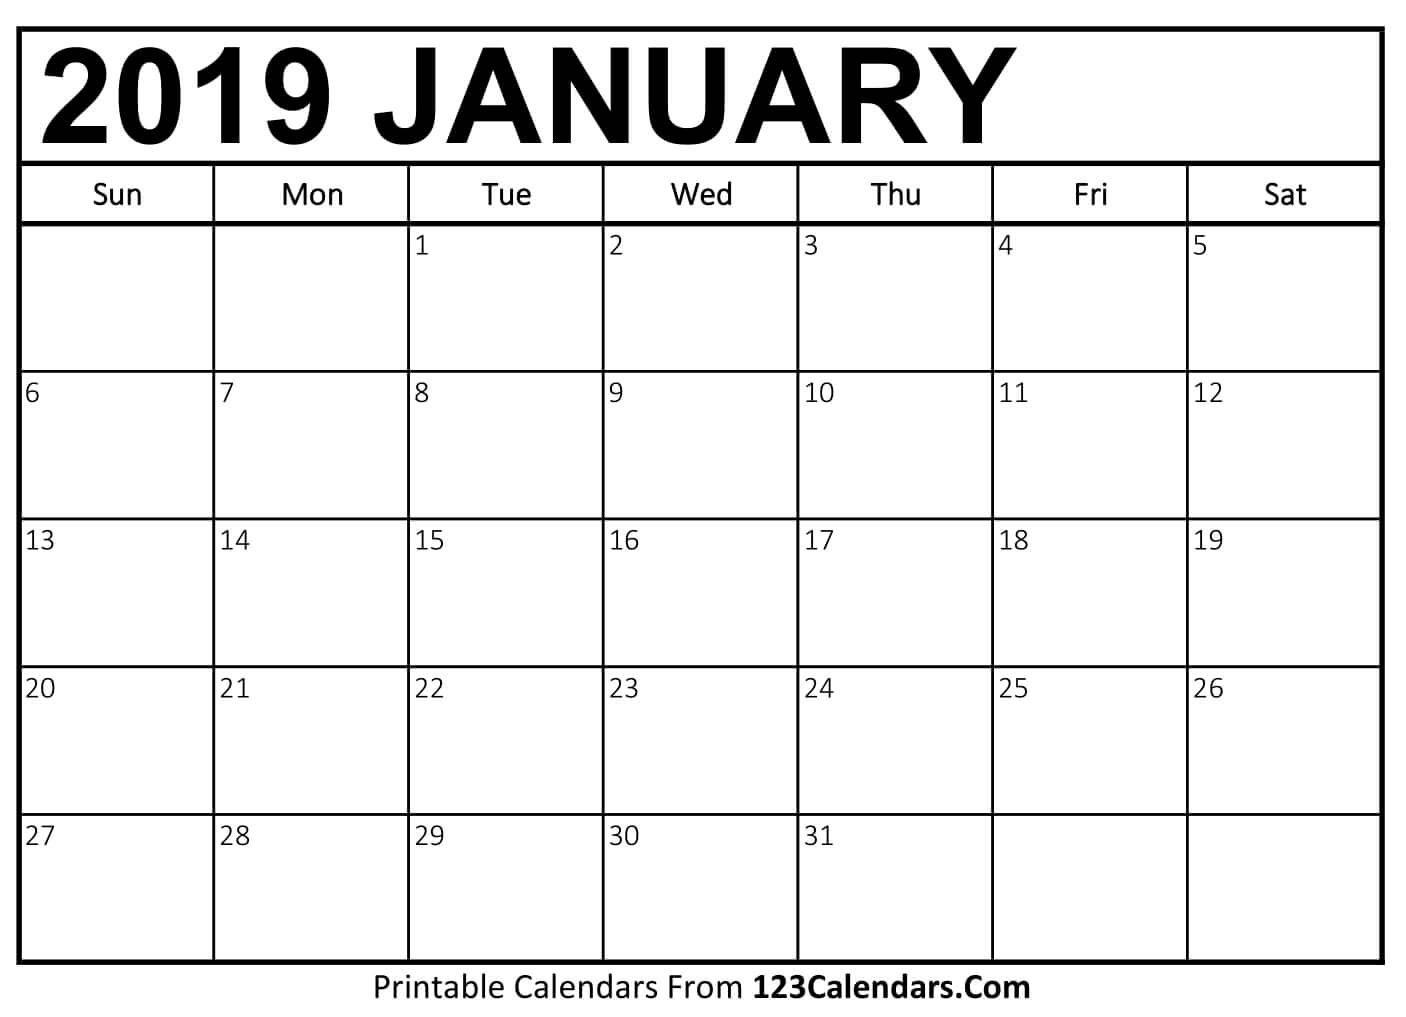 Printable January 2019 Calendar Templates - 123Calendars Jan 4 2019 Calendar